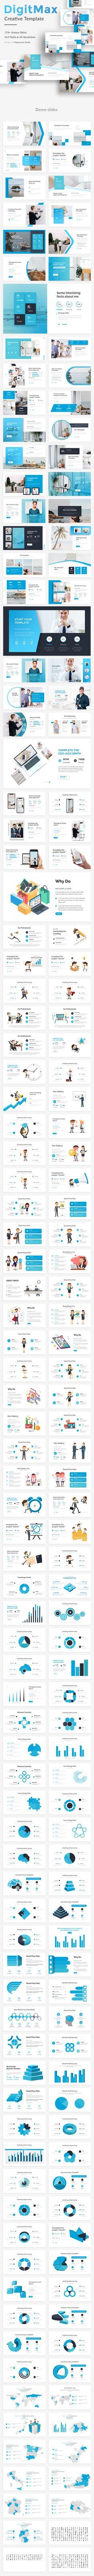 #DigitMax Creative Powerpoint Template - #Creative #PowerPoint #Templates